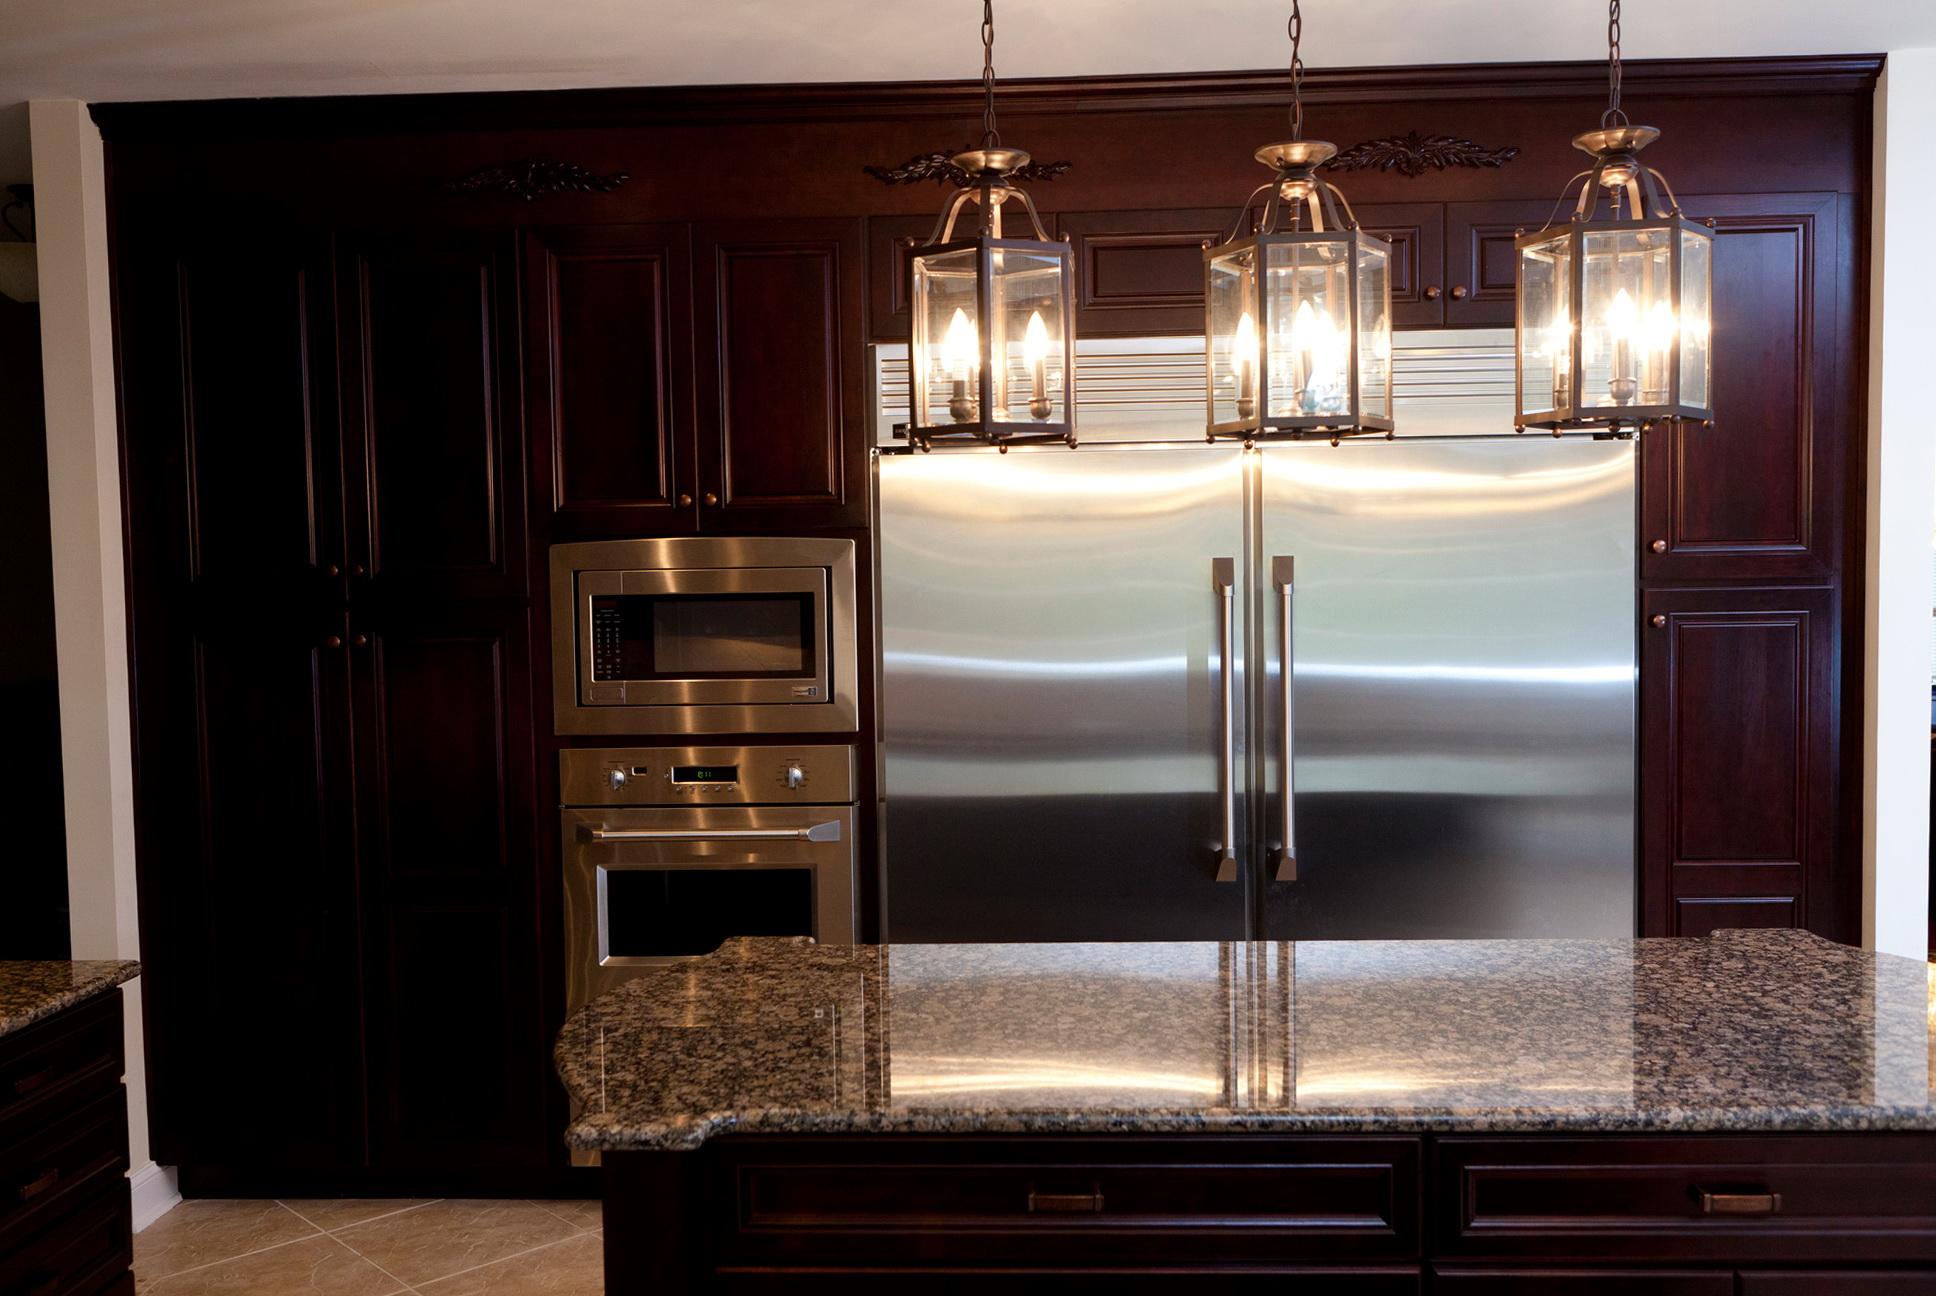 Kitchen Light Fixtures Images